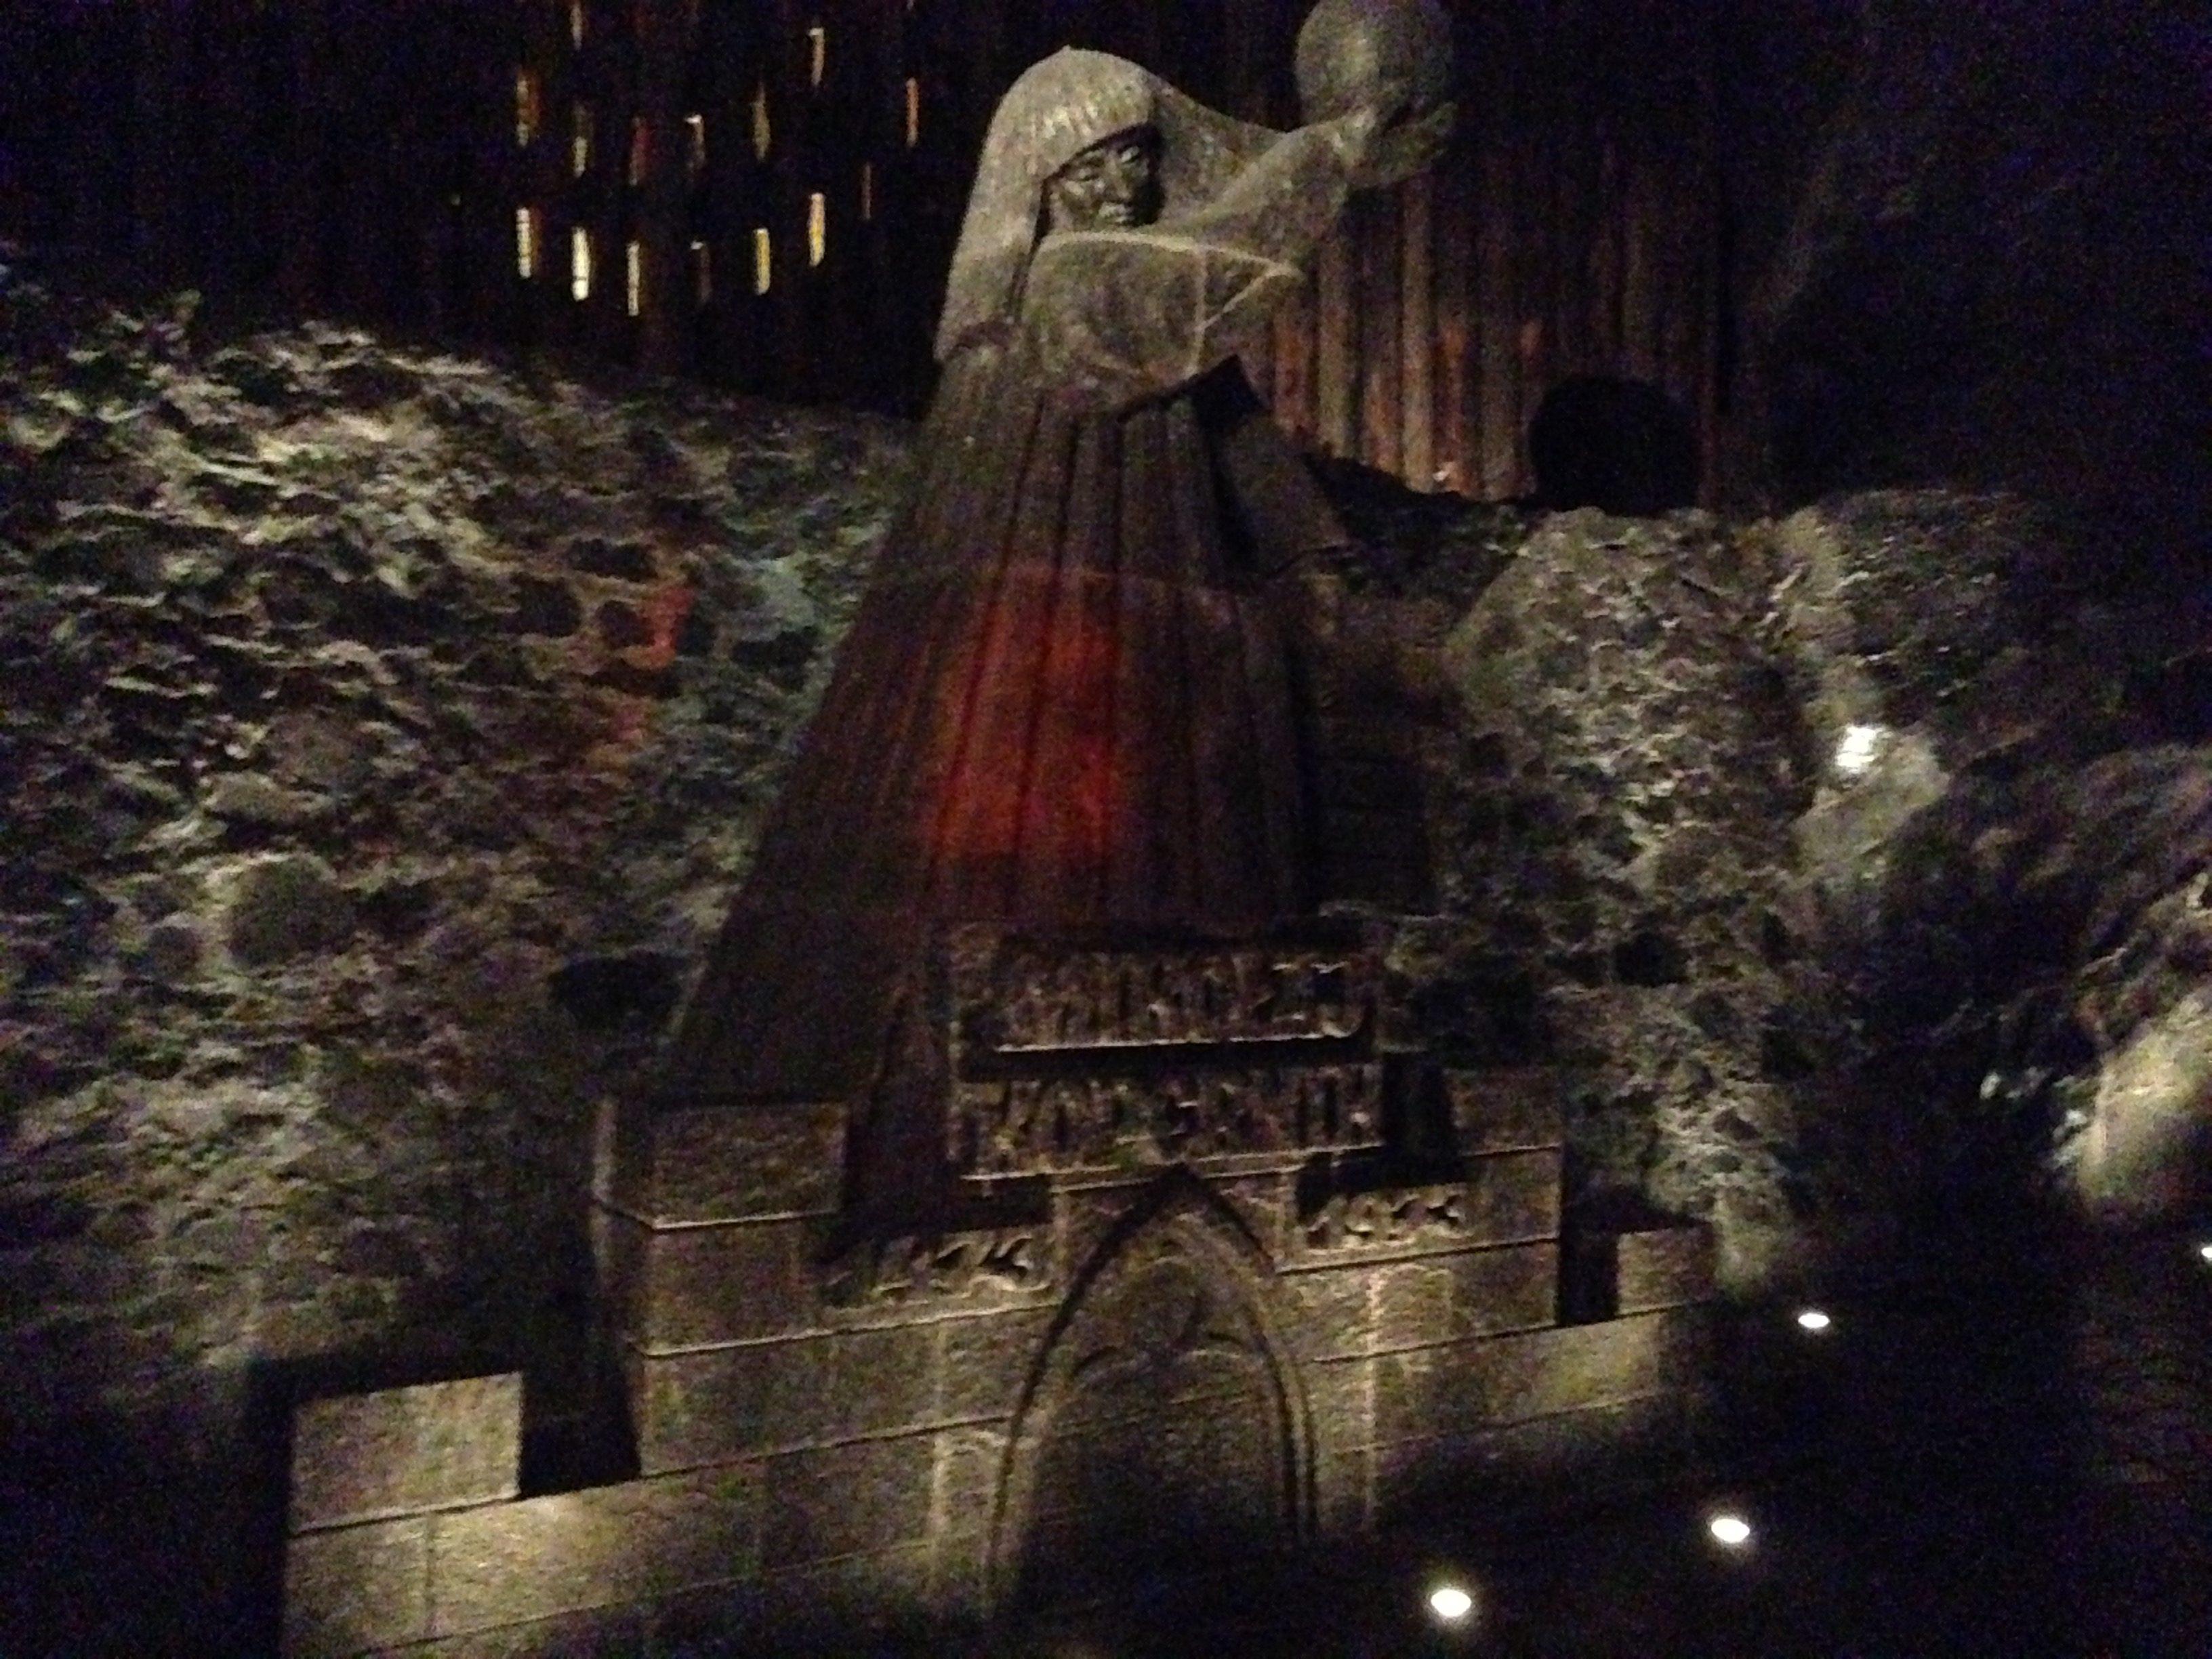 Copernicus salt statue at Wieliczka, Poland